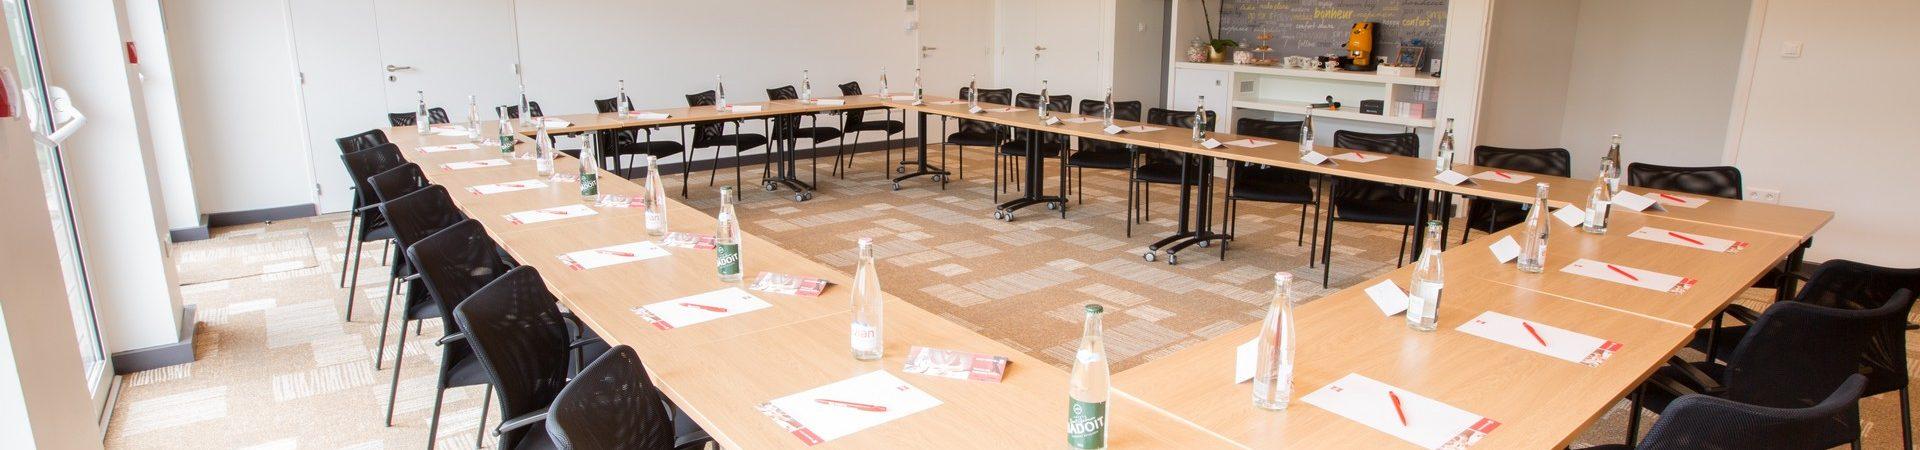 SALLE-SEMINAIRE-RECEPTION-CHERBOURG-IBIS-conference-reunion-presentation